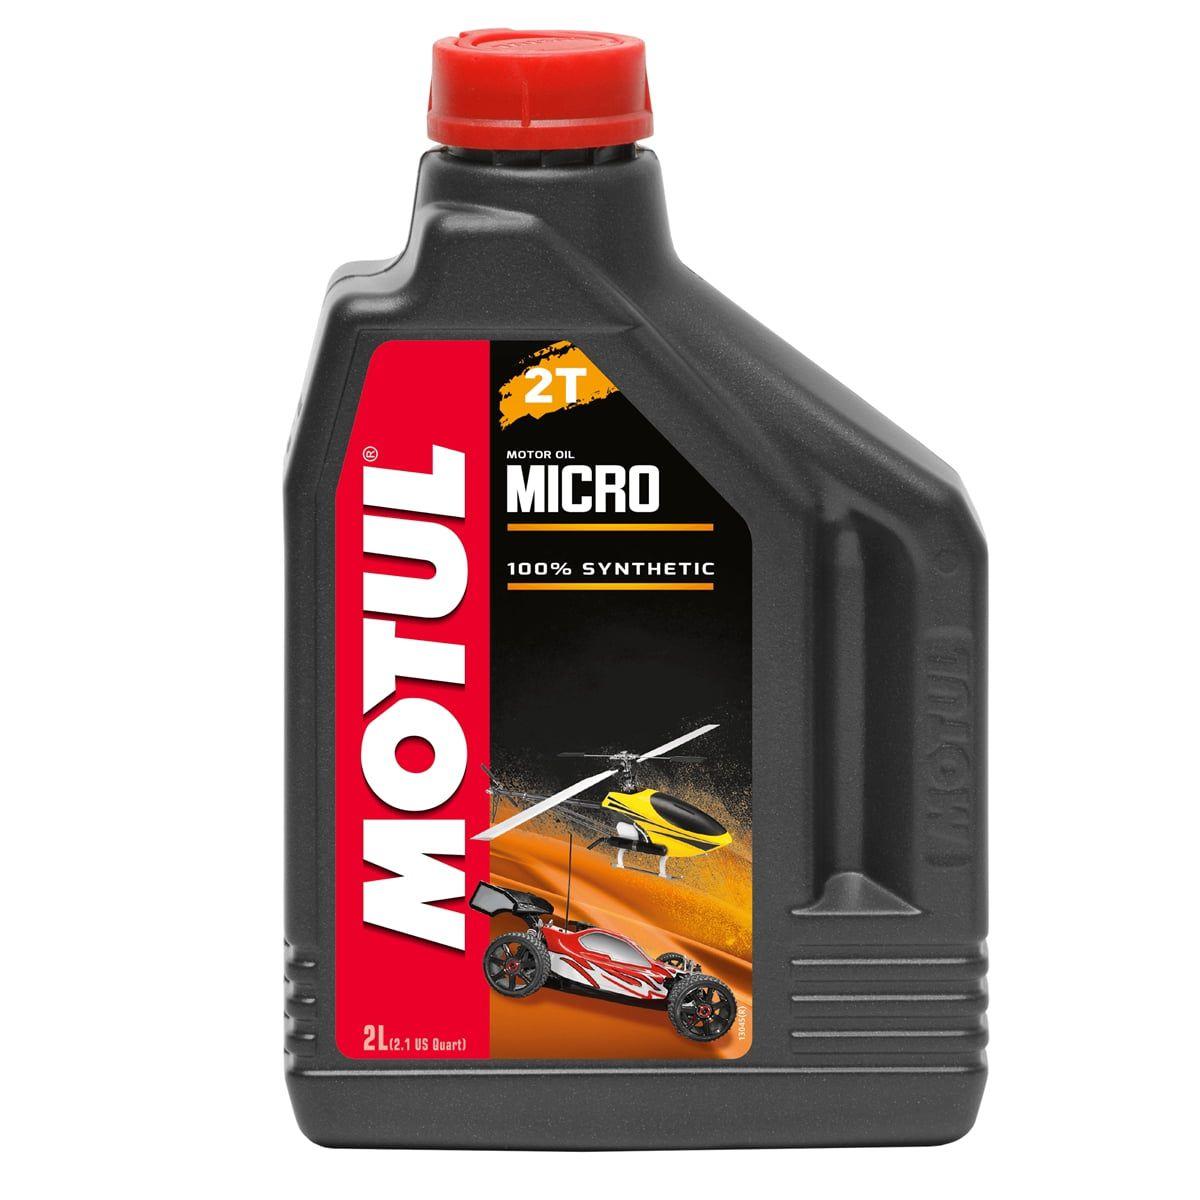 Motul Modelismo Micro 2T 2L